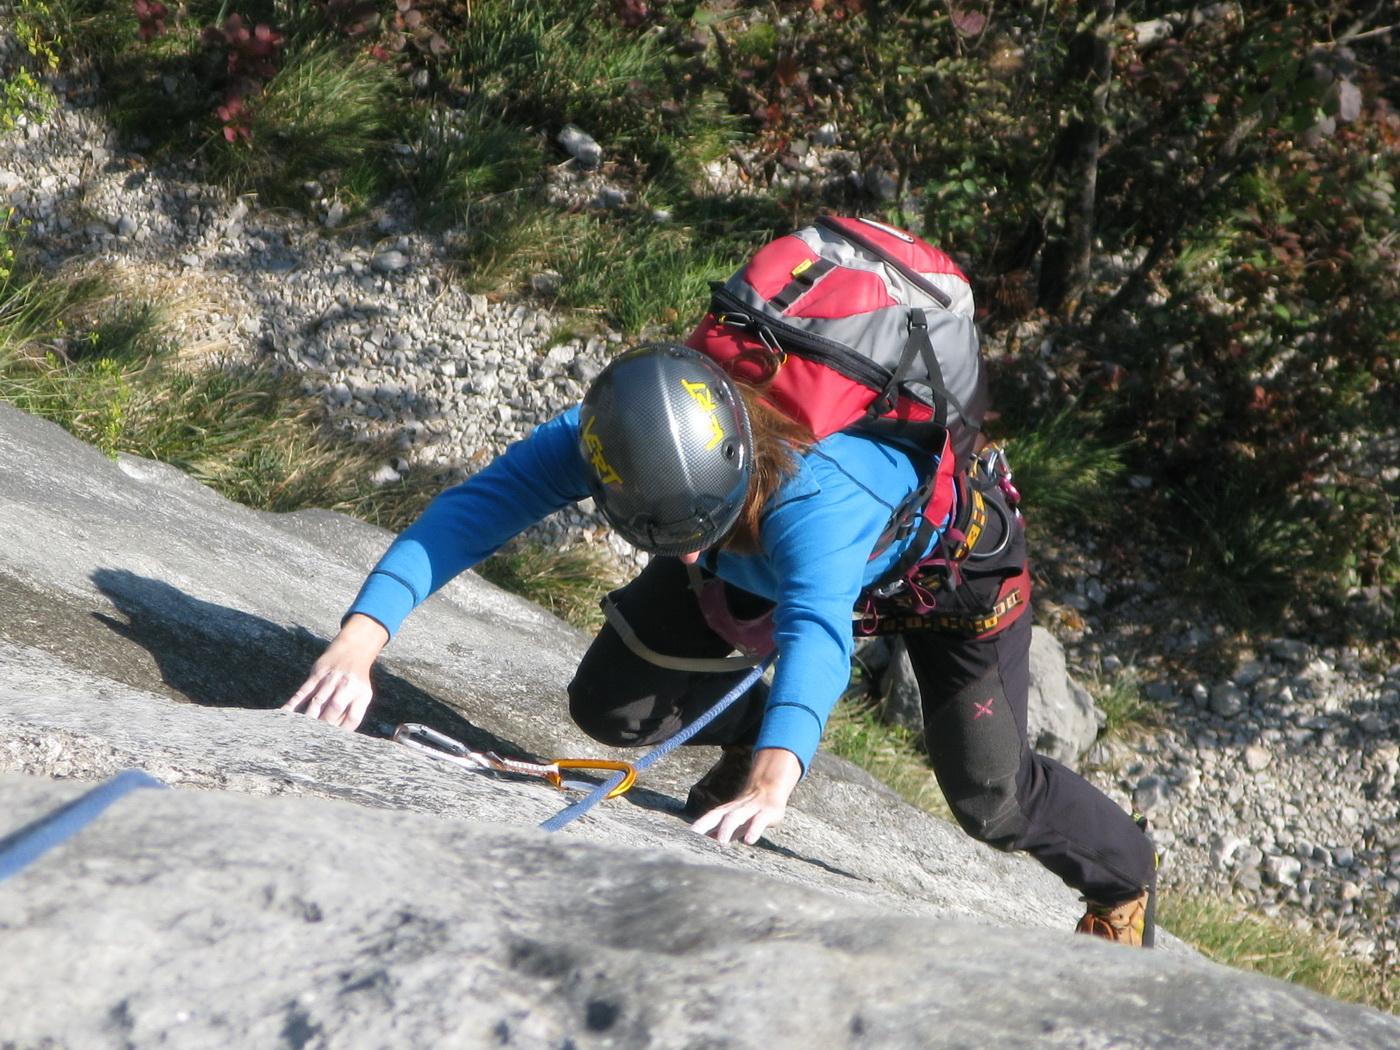 Horolezectvo - Lezenie v Arcu  Placche Zebrate - Vetroplach magazin 0bf69a1e992